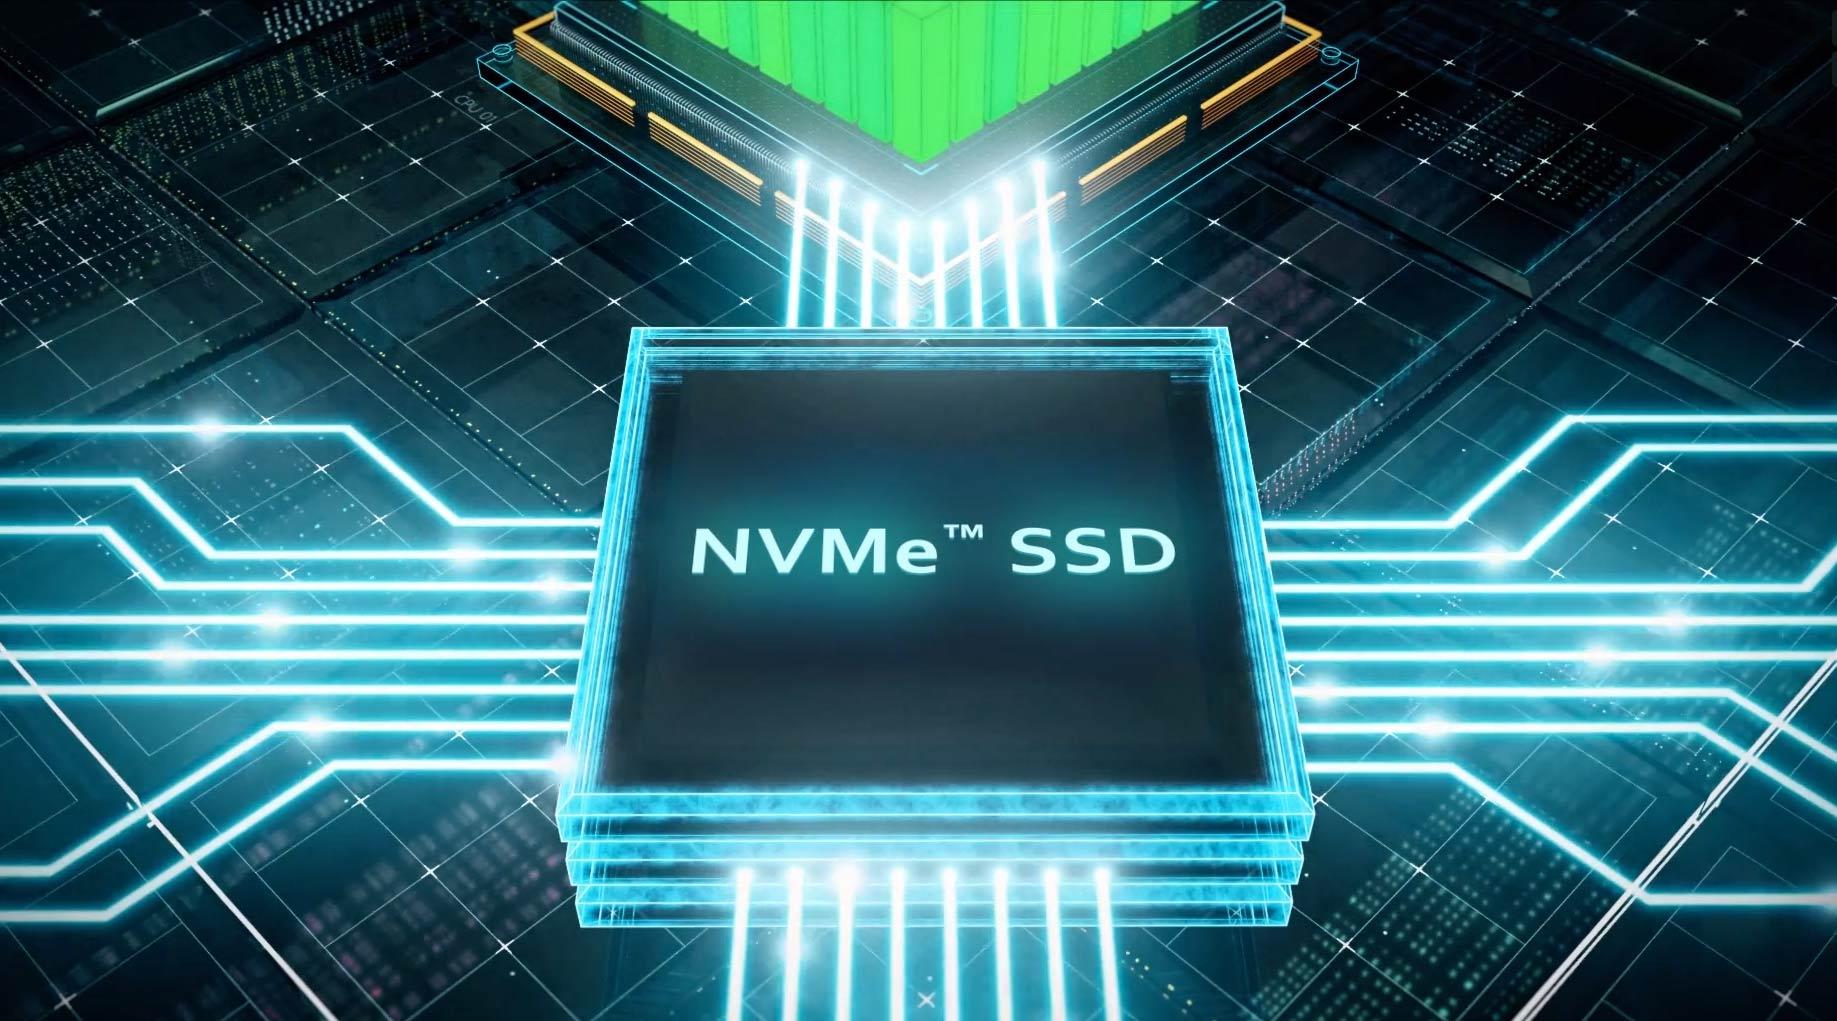 NVMe makes data thrive